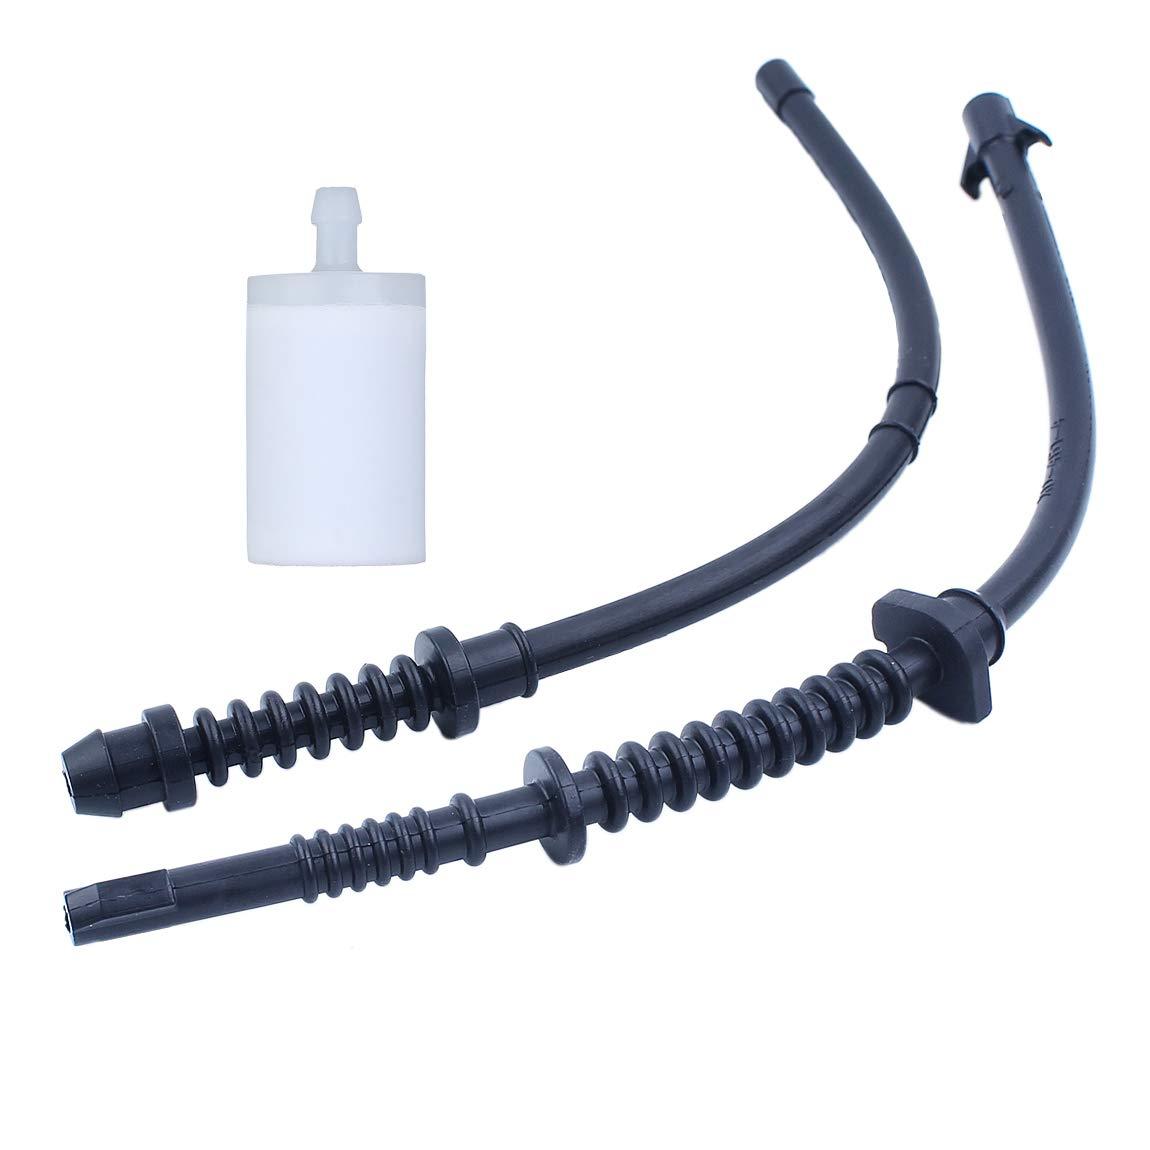 Haishine Fuel Return Line Fuel Filter Fit Husqvarna 435 440 445 450 E 544128601 577535101 523055201